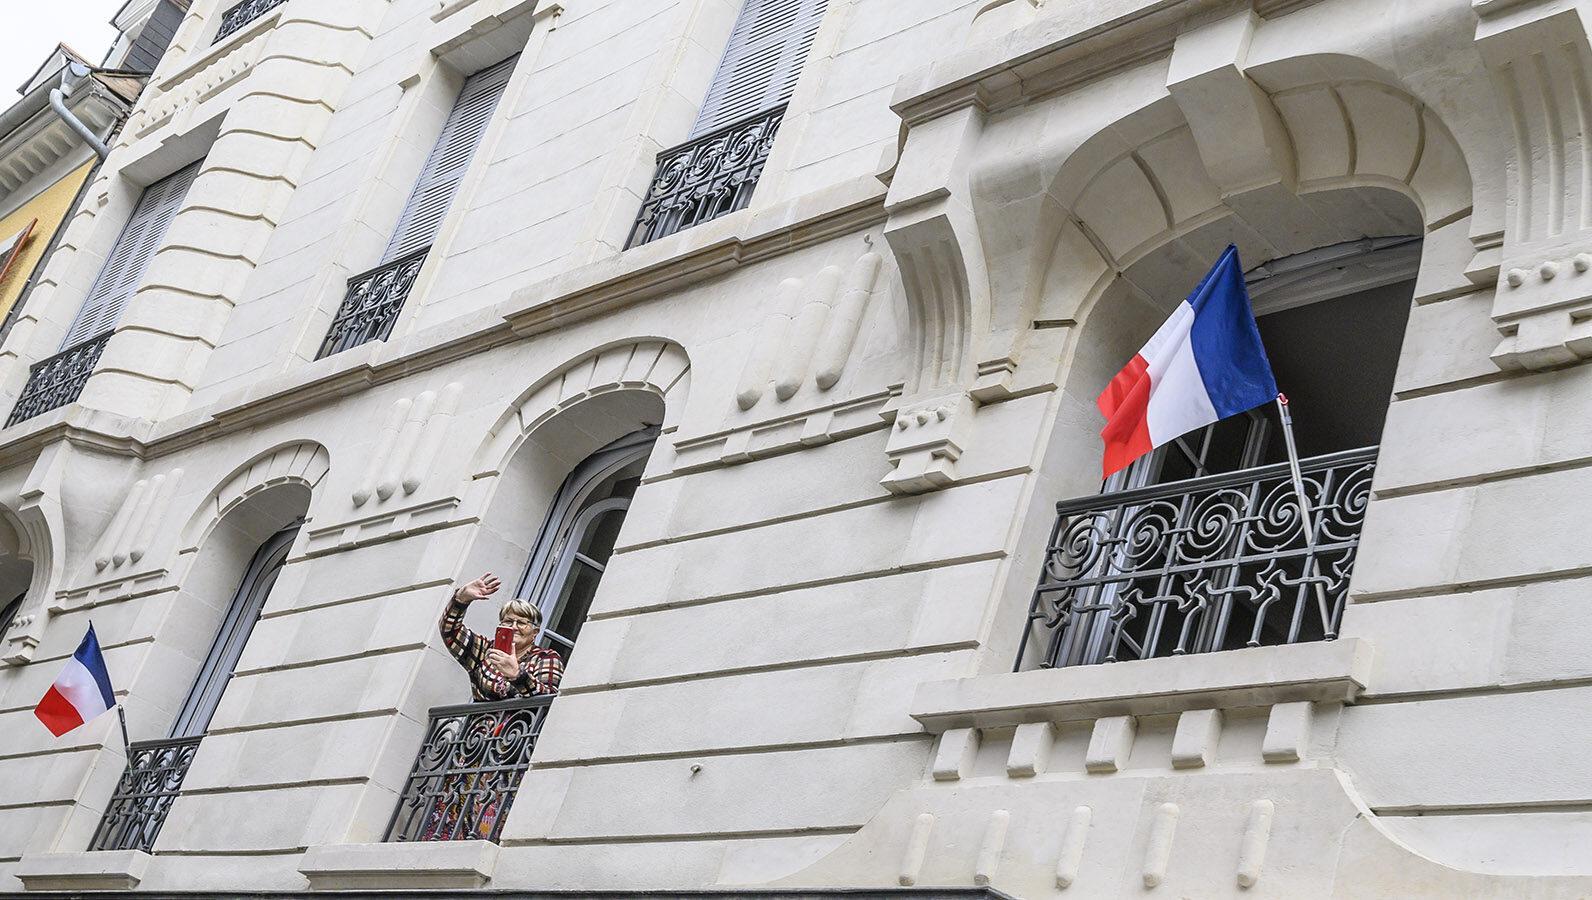 Auch Madame zeigt Flagge bei der Tour de France in Pau. Foto: Hilke Maunder